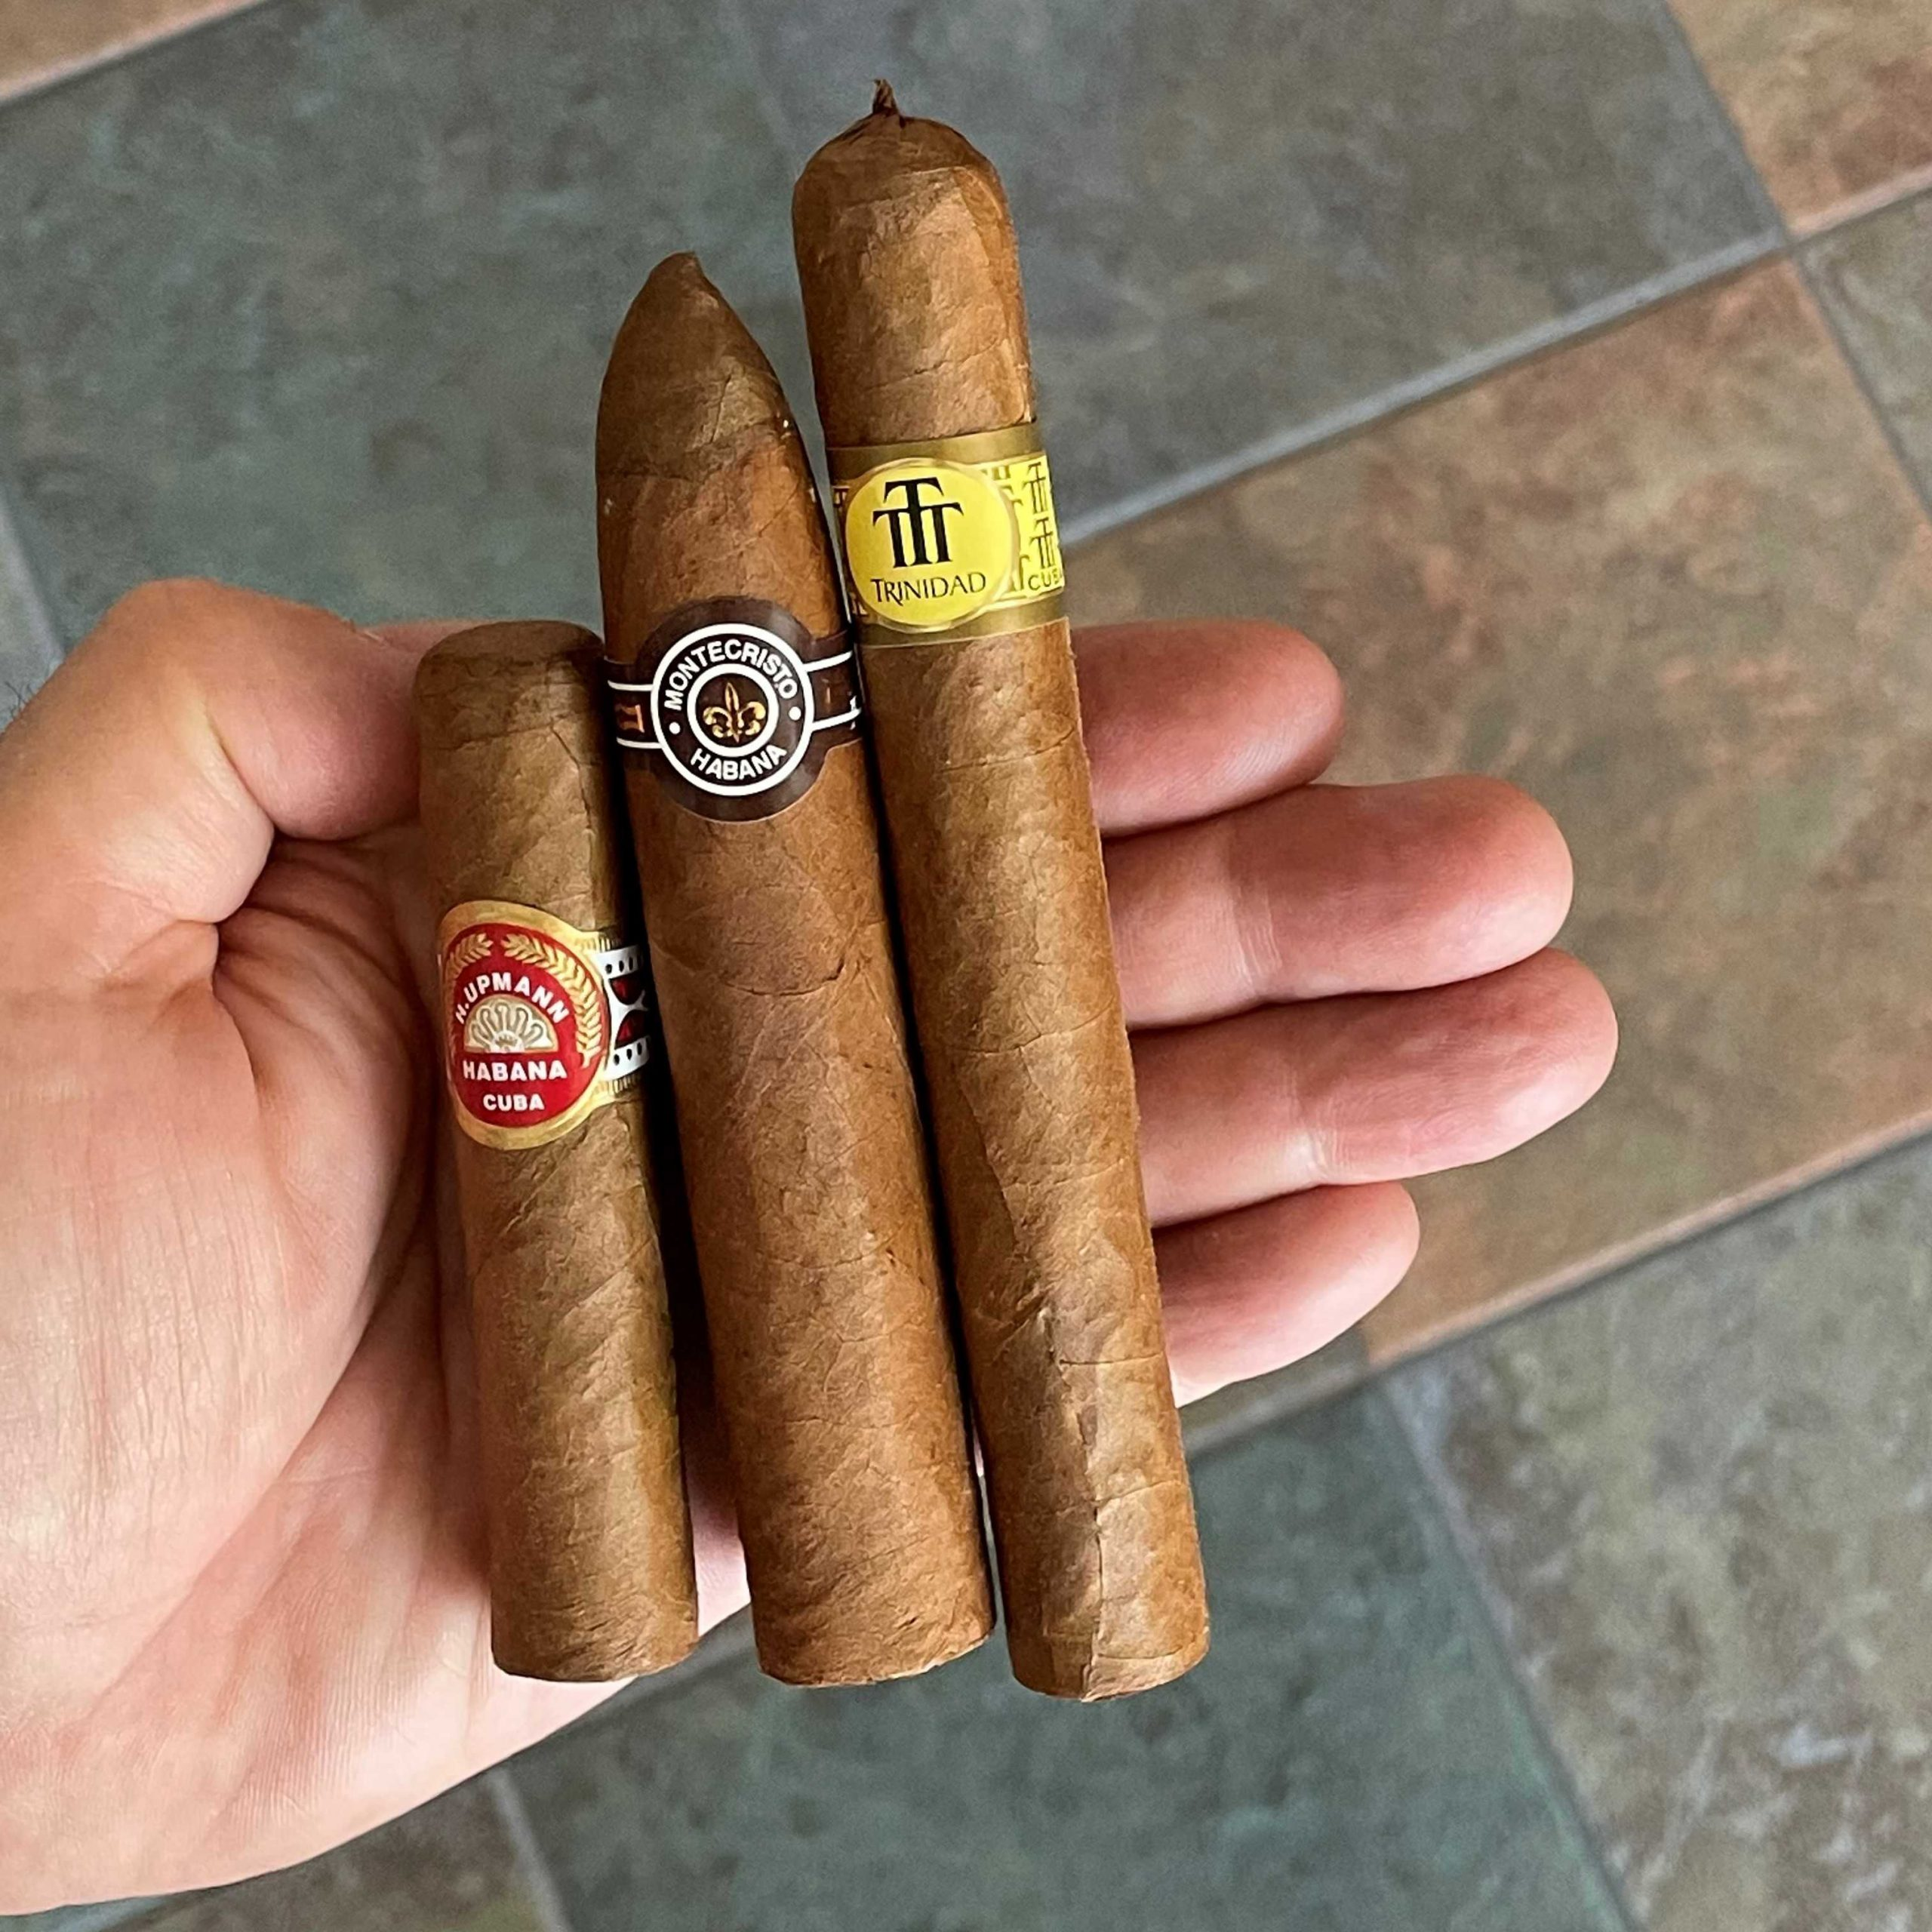 The Ultimate Cuban Sample Pack